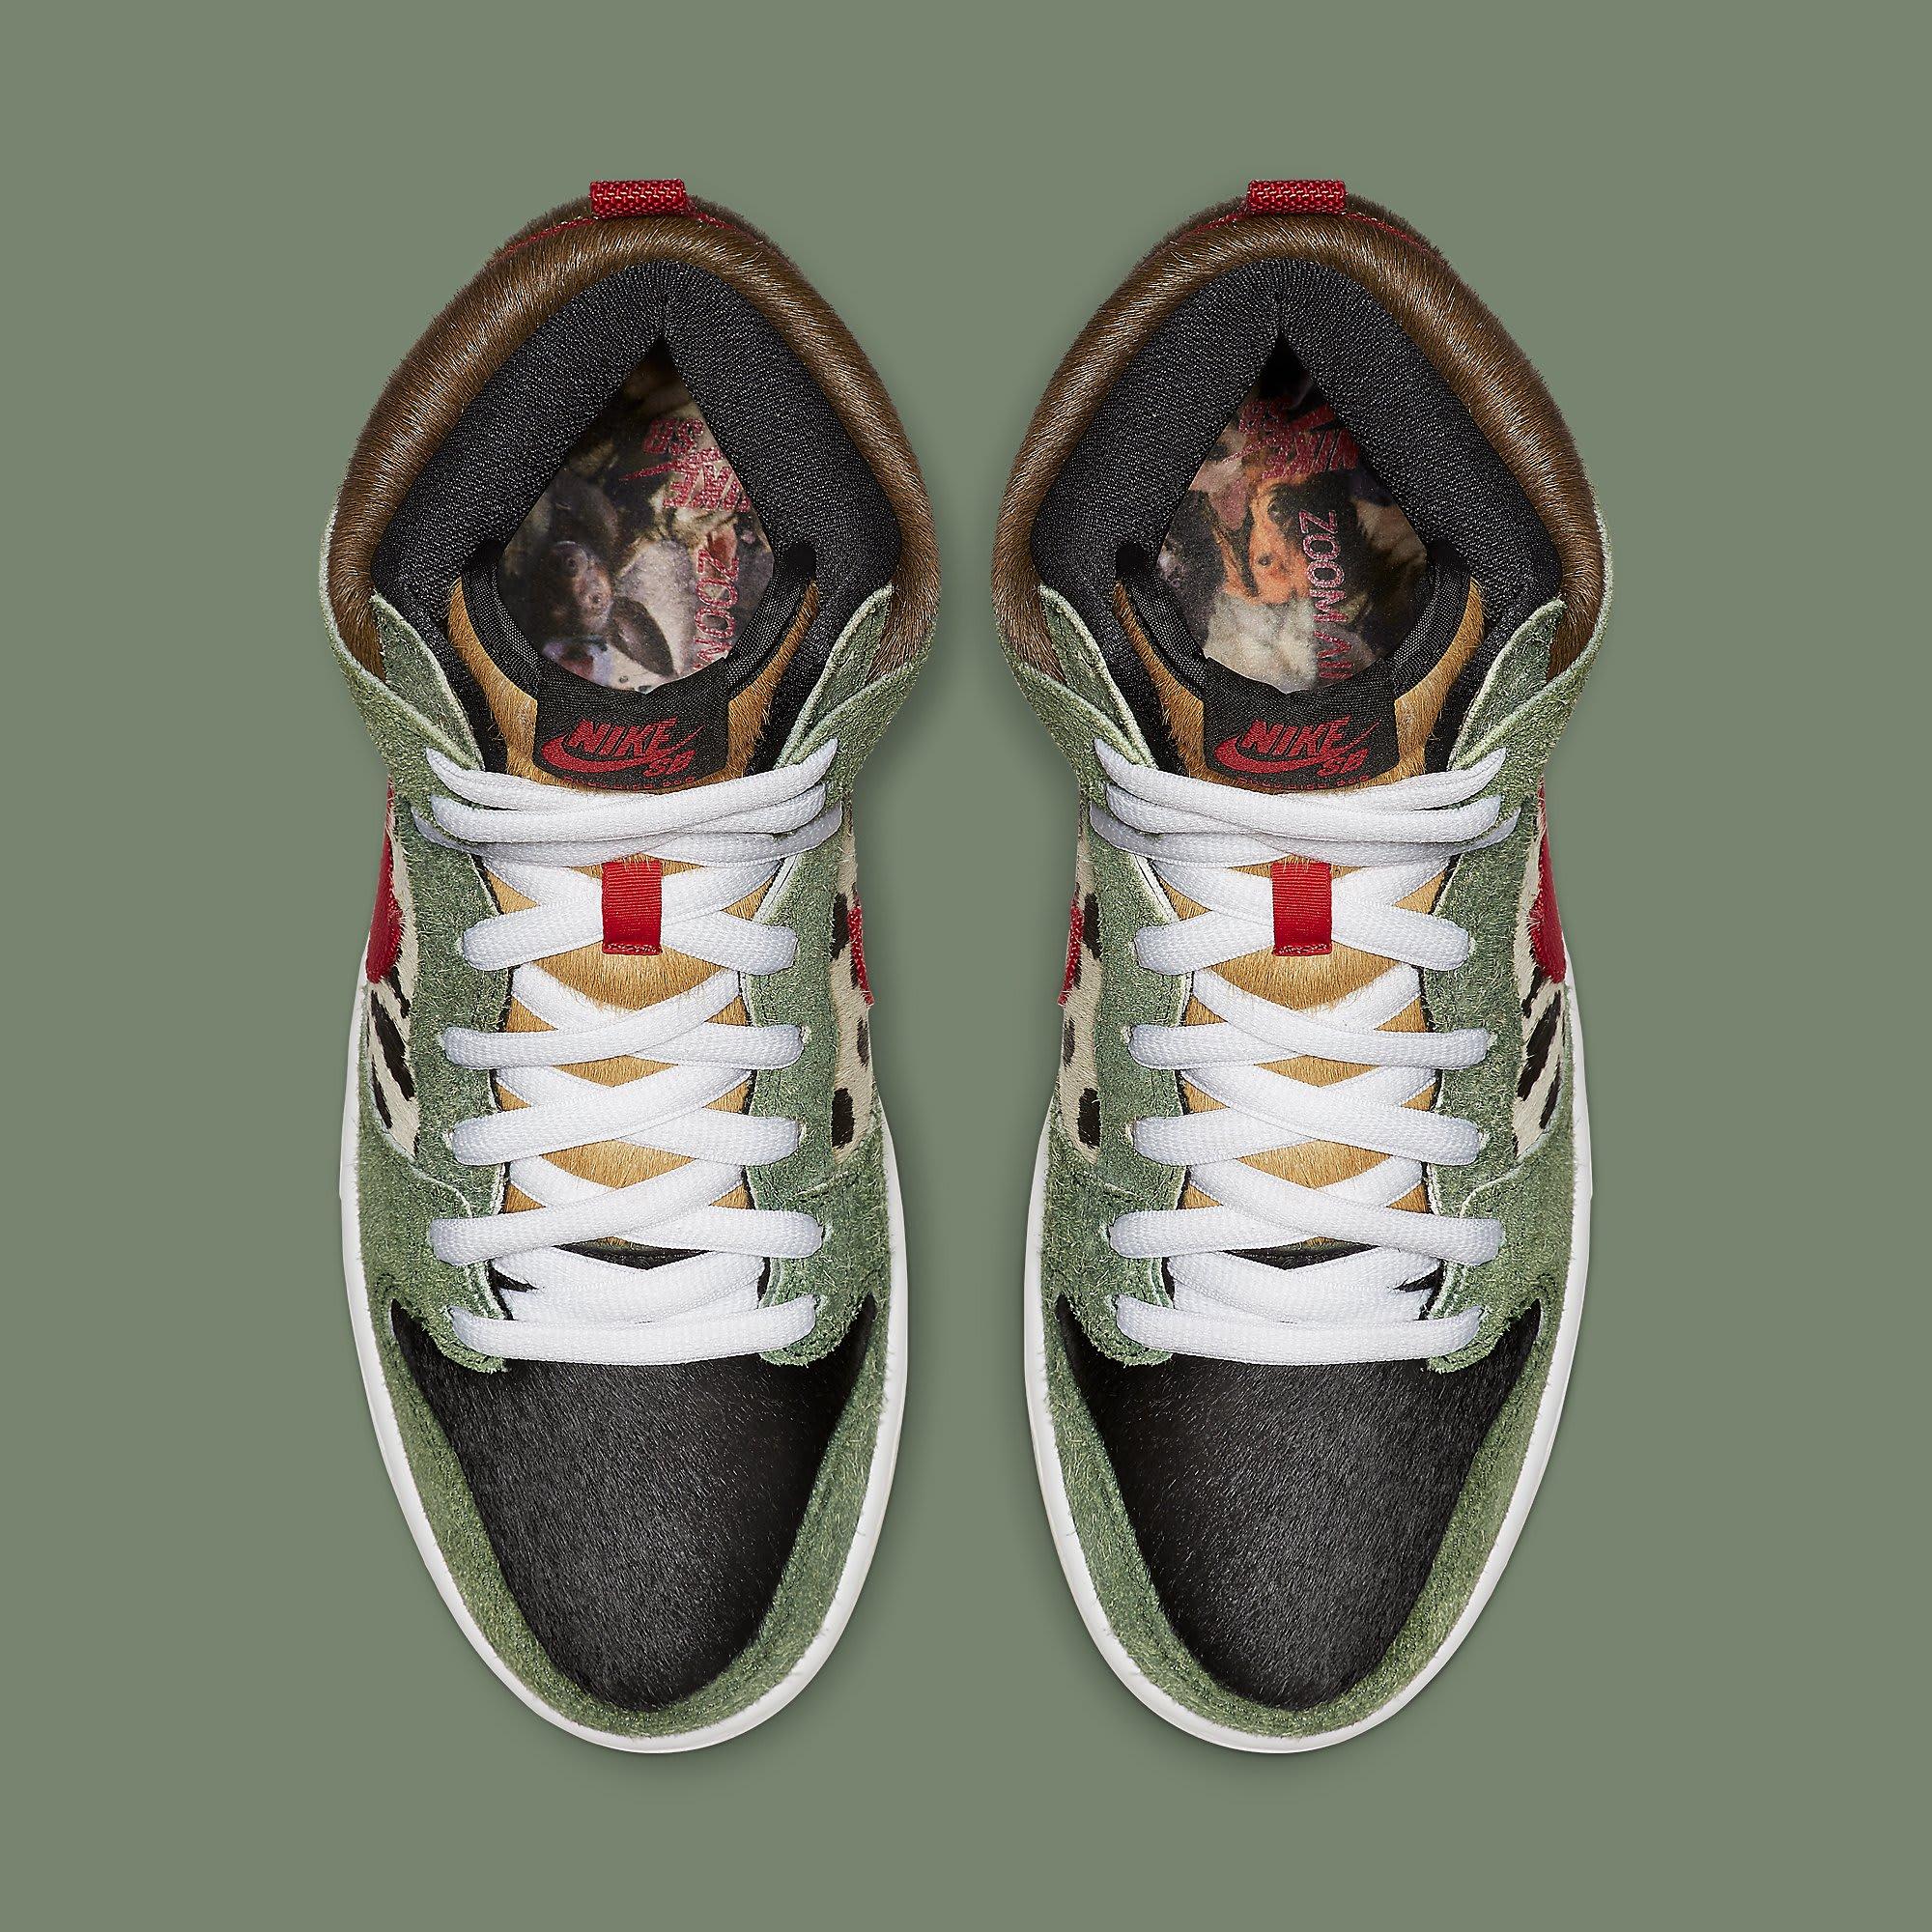 cheap for discount 1aead ca87b Image via Nike Nike SB Dunk High Dog Walker Release Date BQ6827-300 Top